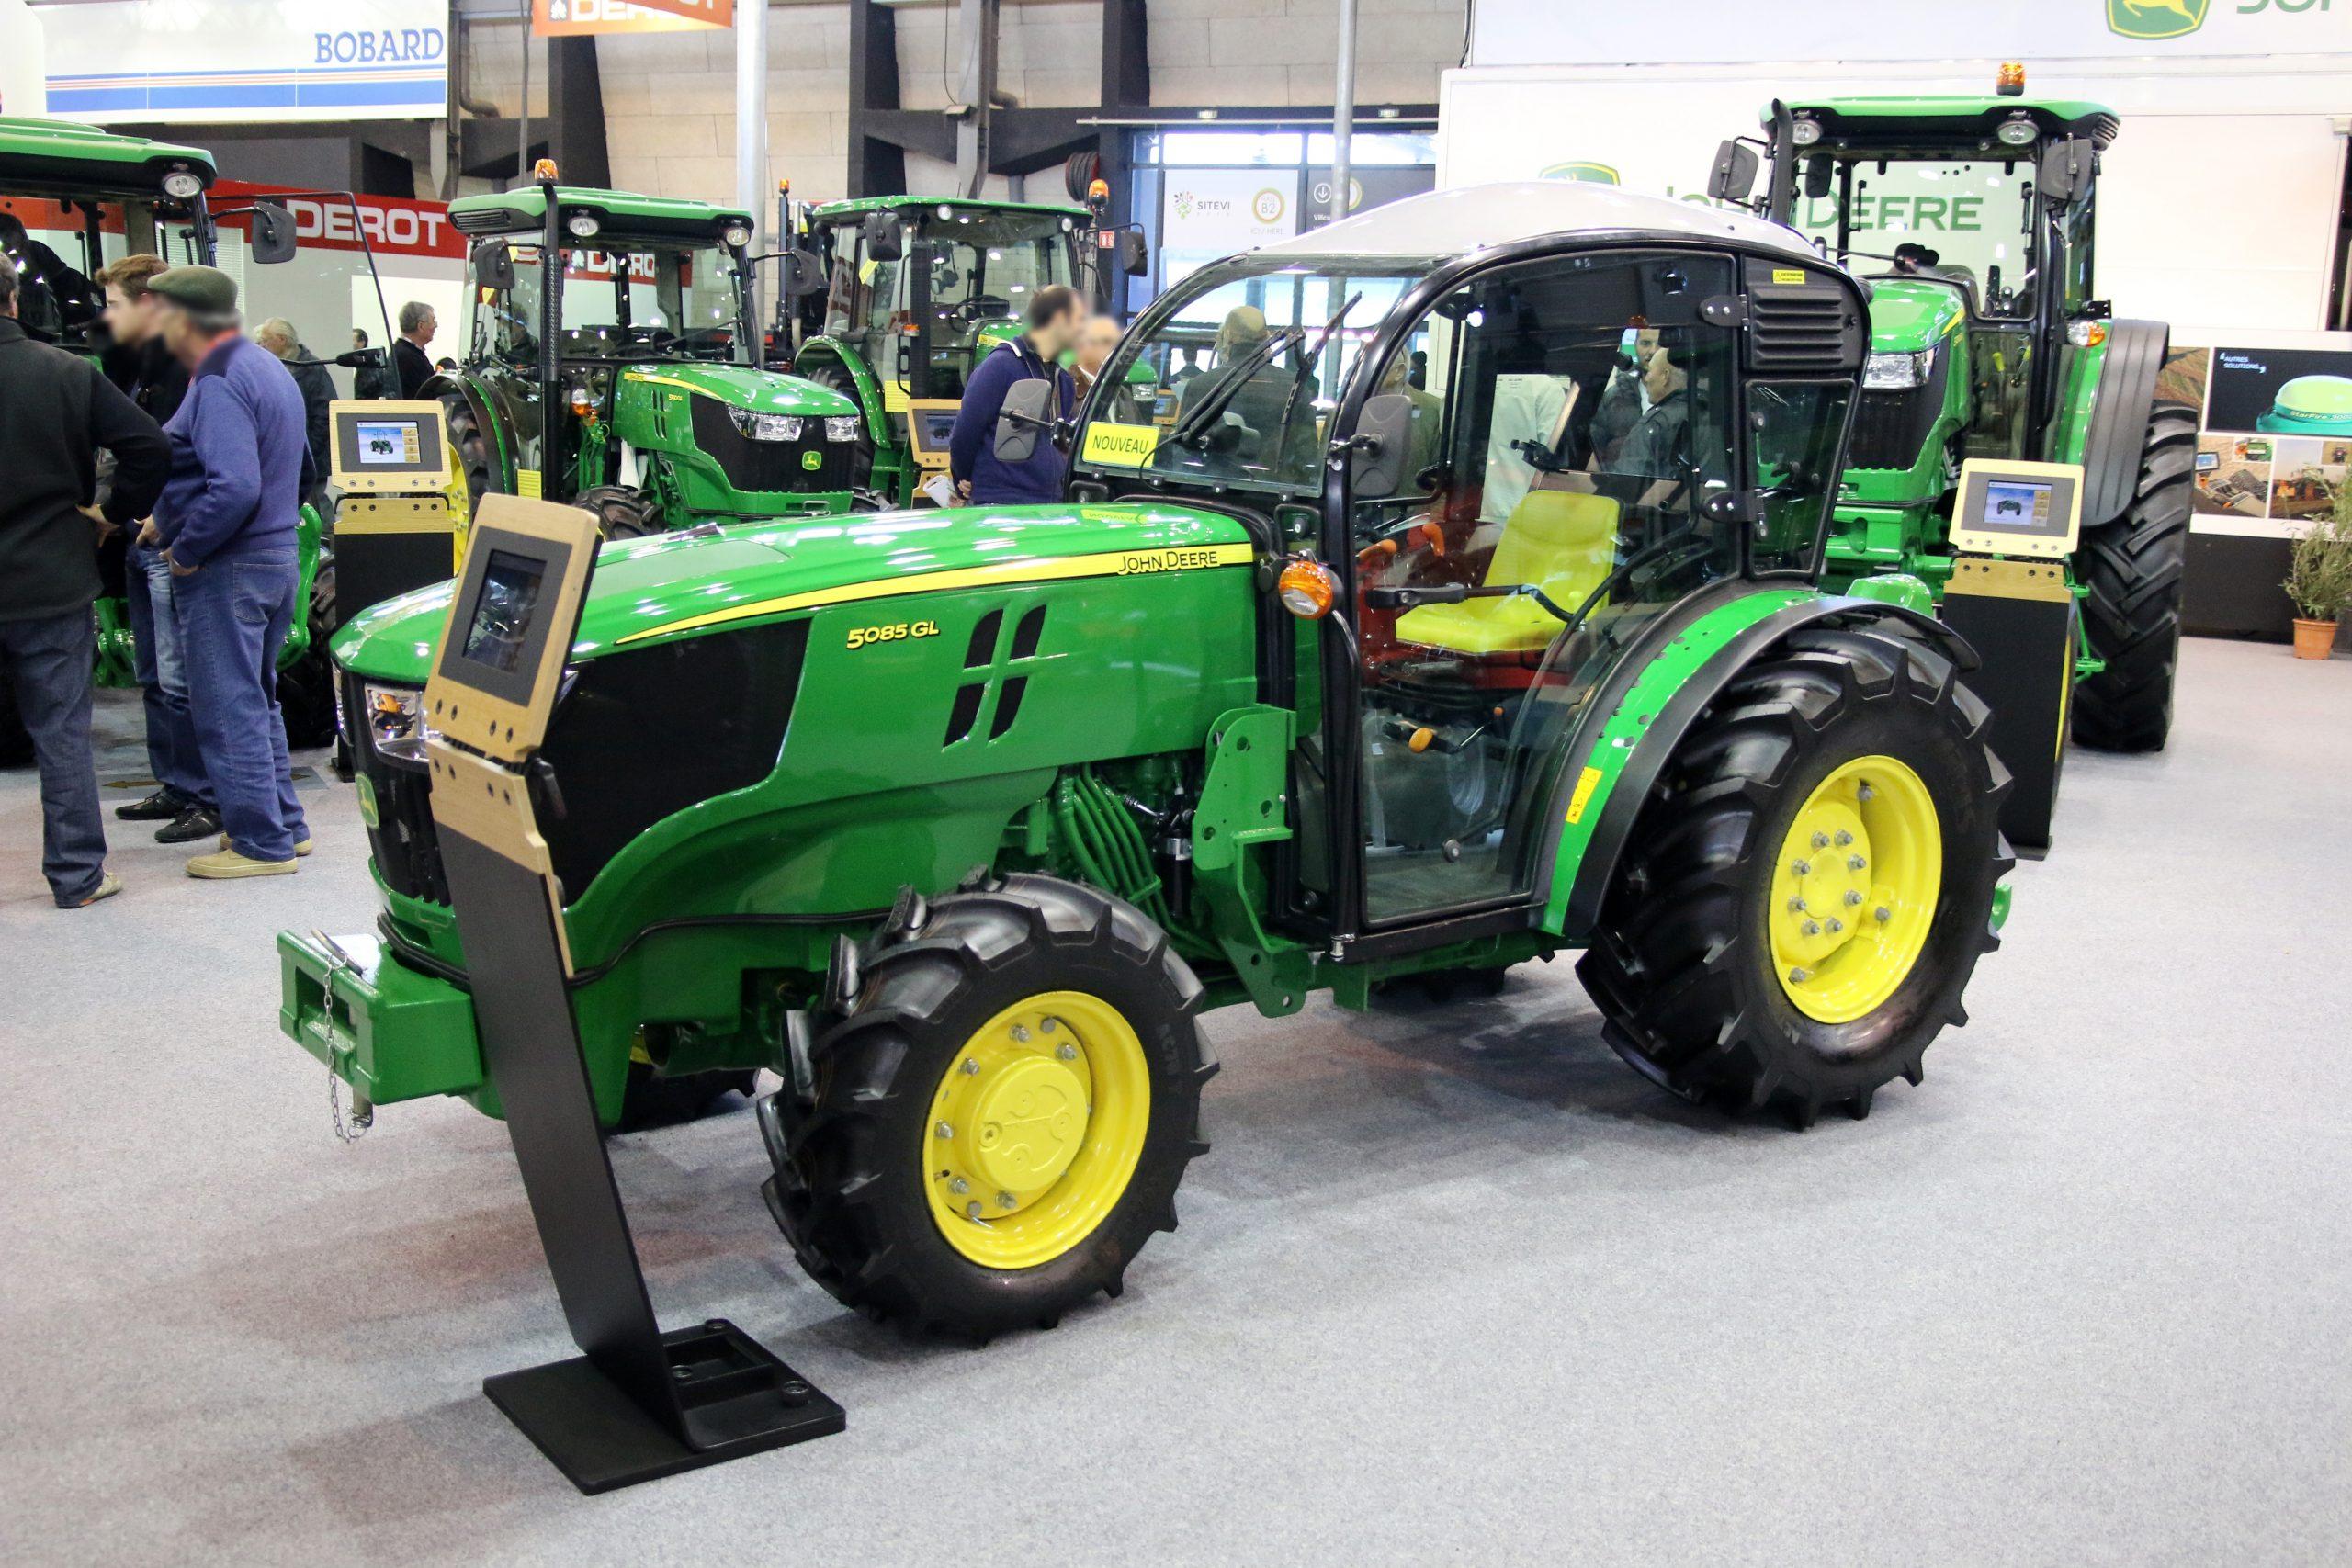 File:tracteur John Deer - Wikimedia Commons concernant Image Tracteur John Deere